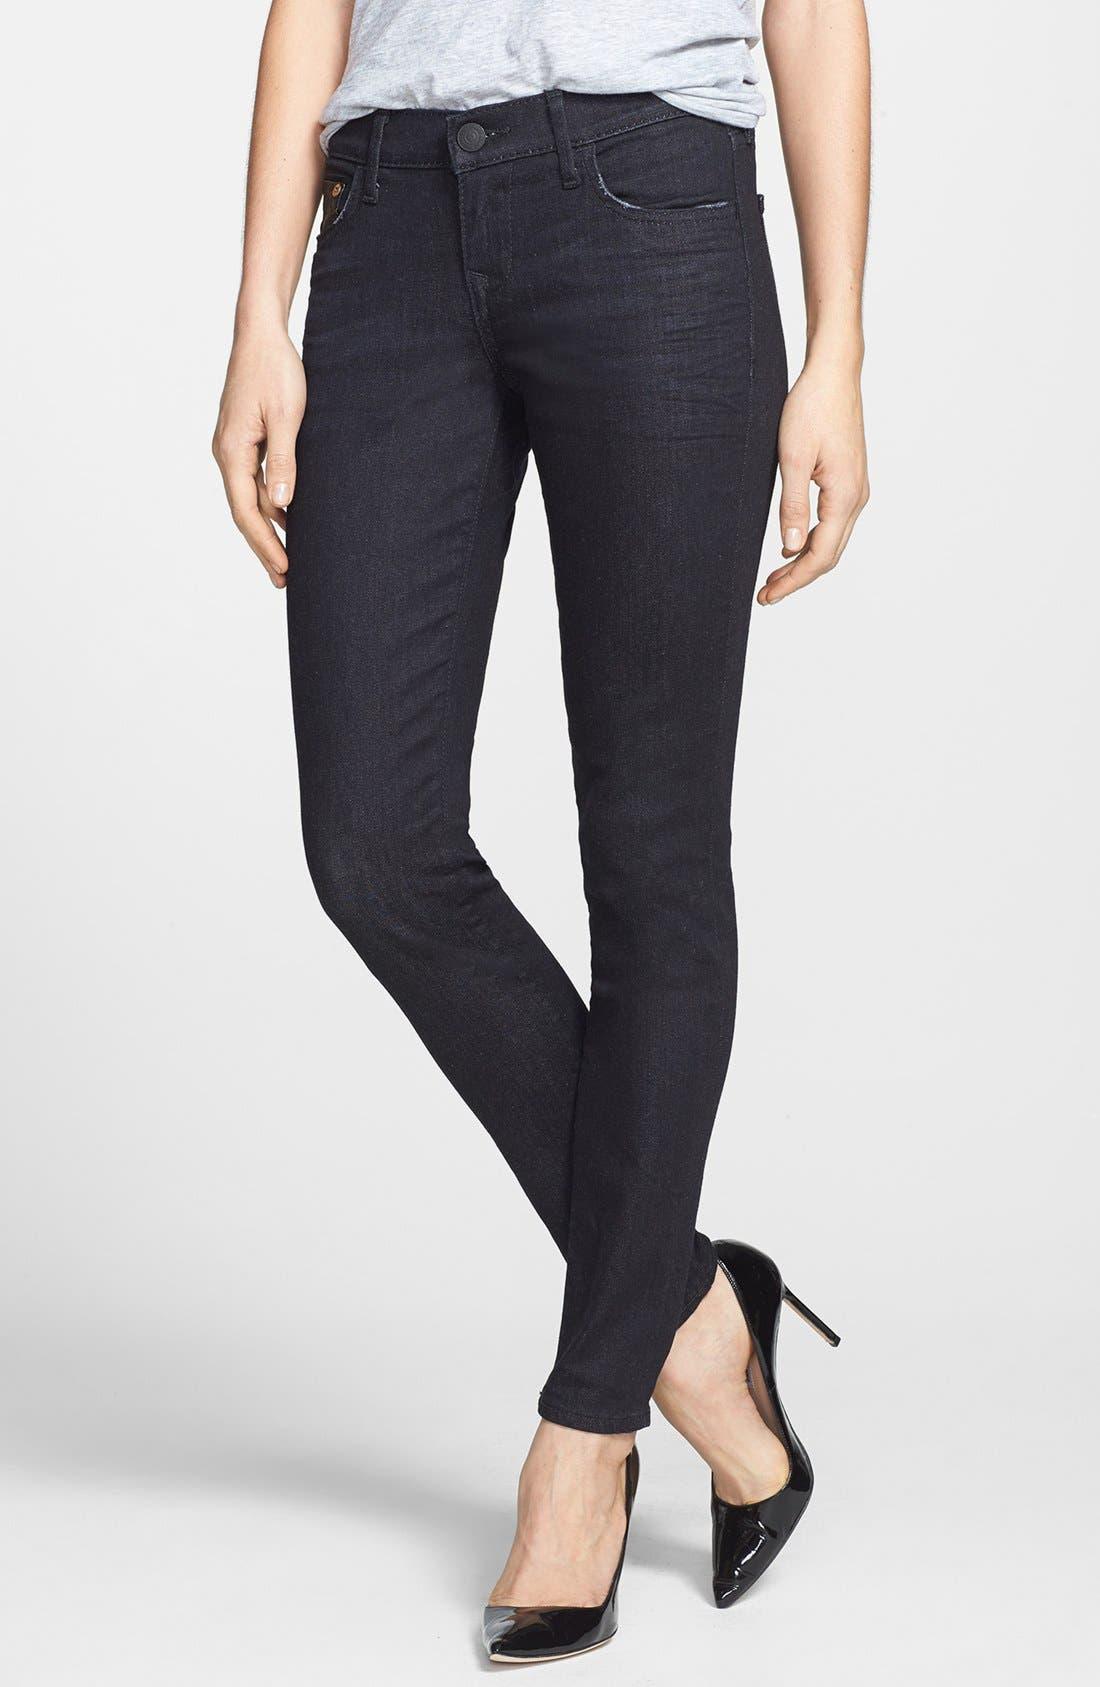 Main Image - True Religion Brand Jeans 'Casey' Skinny Jeans (Black Smoke Vintage)